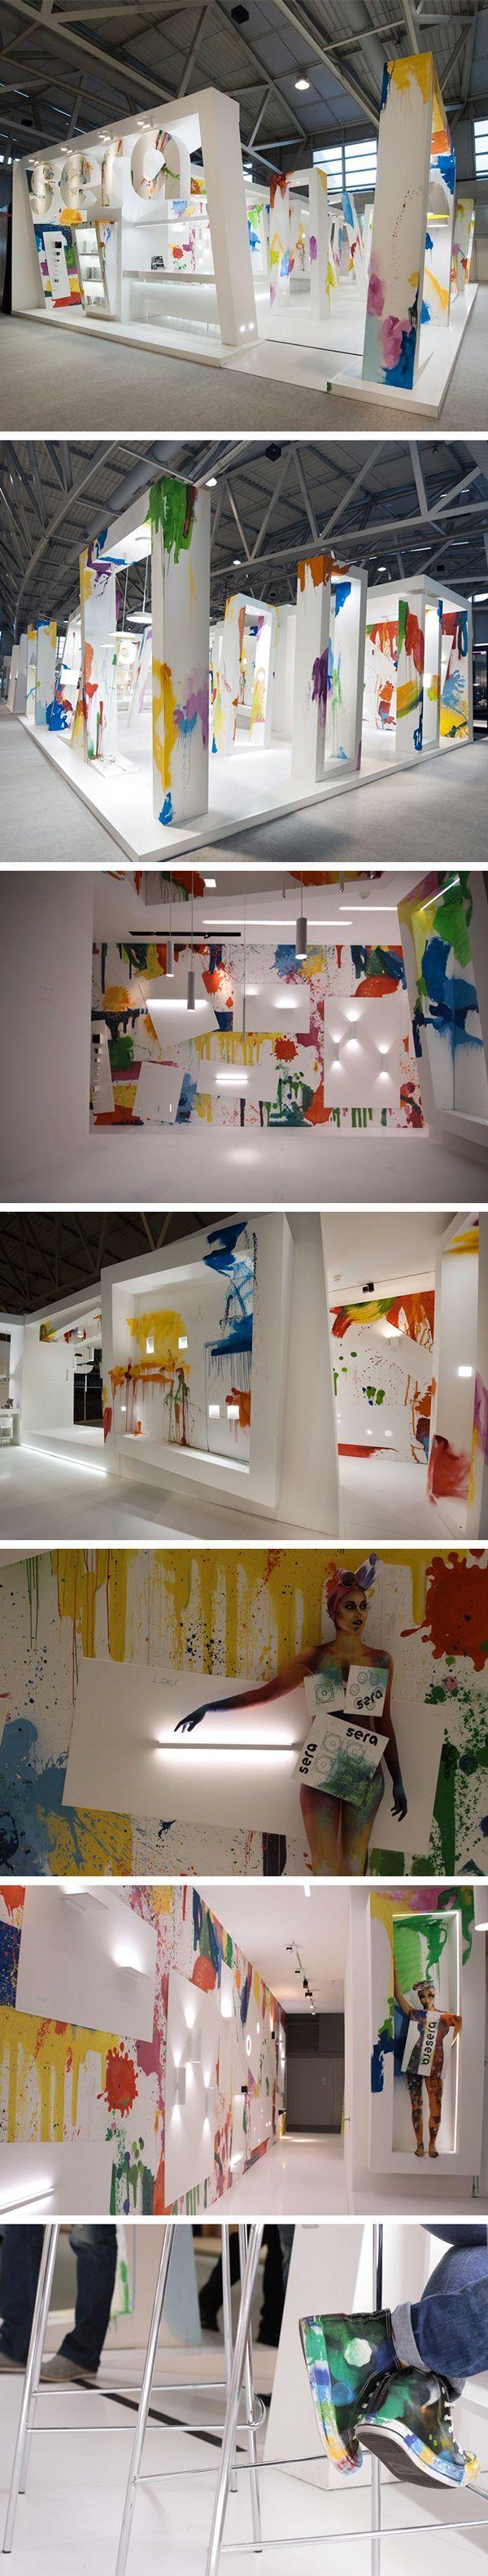 Exhibition stand @ Light + Building •Stand Design: Xilos Design Studio •Stand Build: Xilos Temporary Architecture